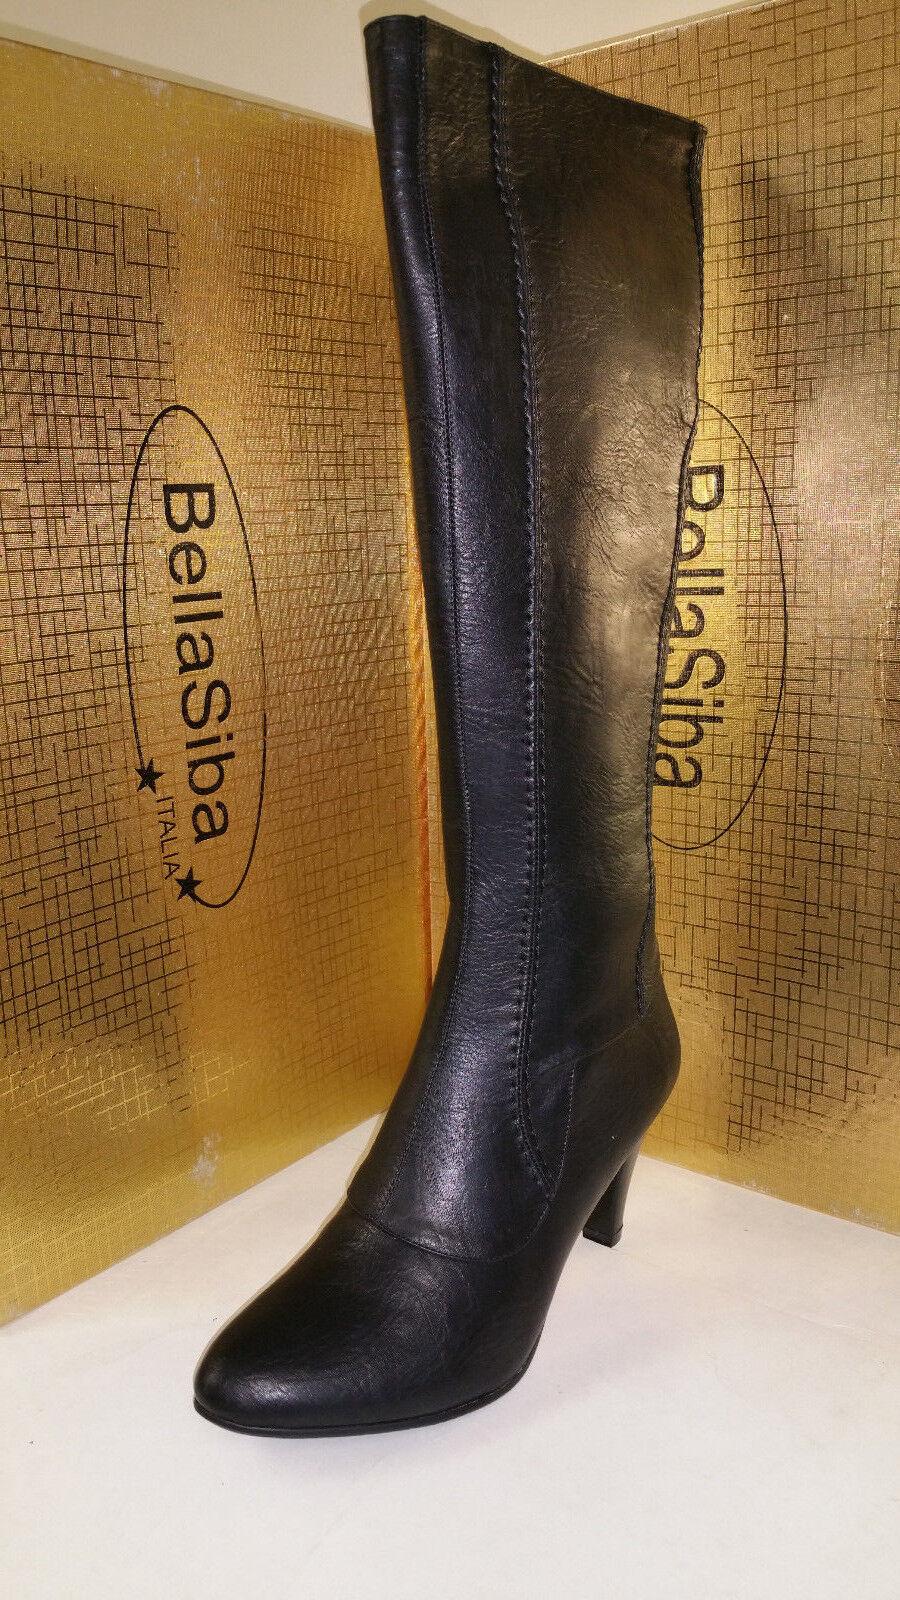 Bella Siba Italia Black Womens Knee High Heel Fashion Boots size 37-41 21082